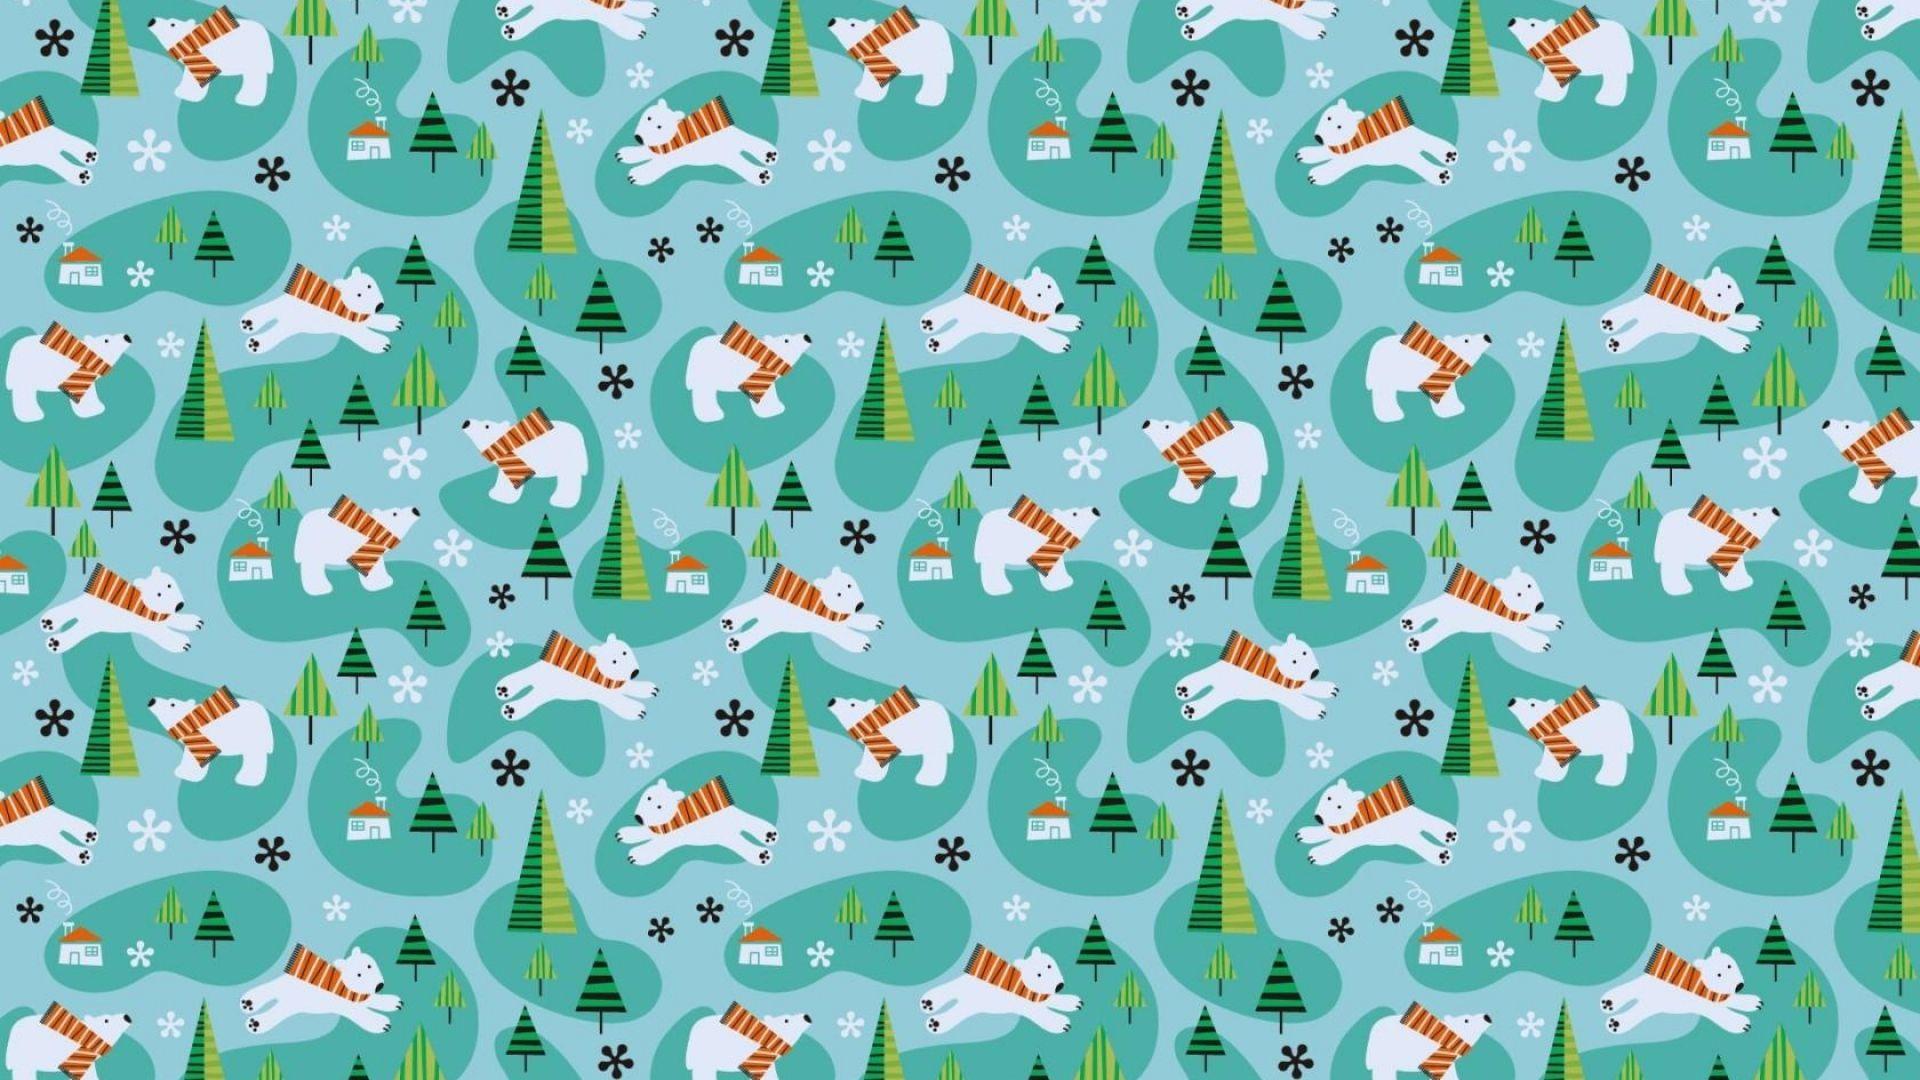 Kids Wallpaper Texture Hd Wallpapers On Picsfair Com Wallpaper Textured Wallpaper Kids Wallpaper